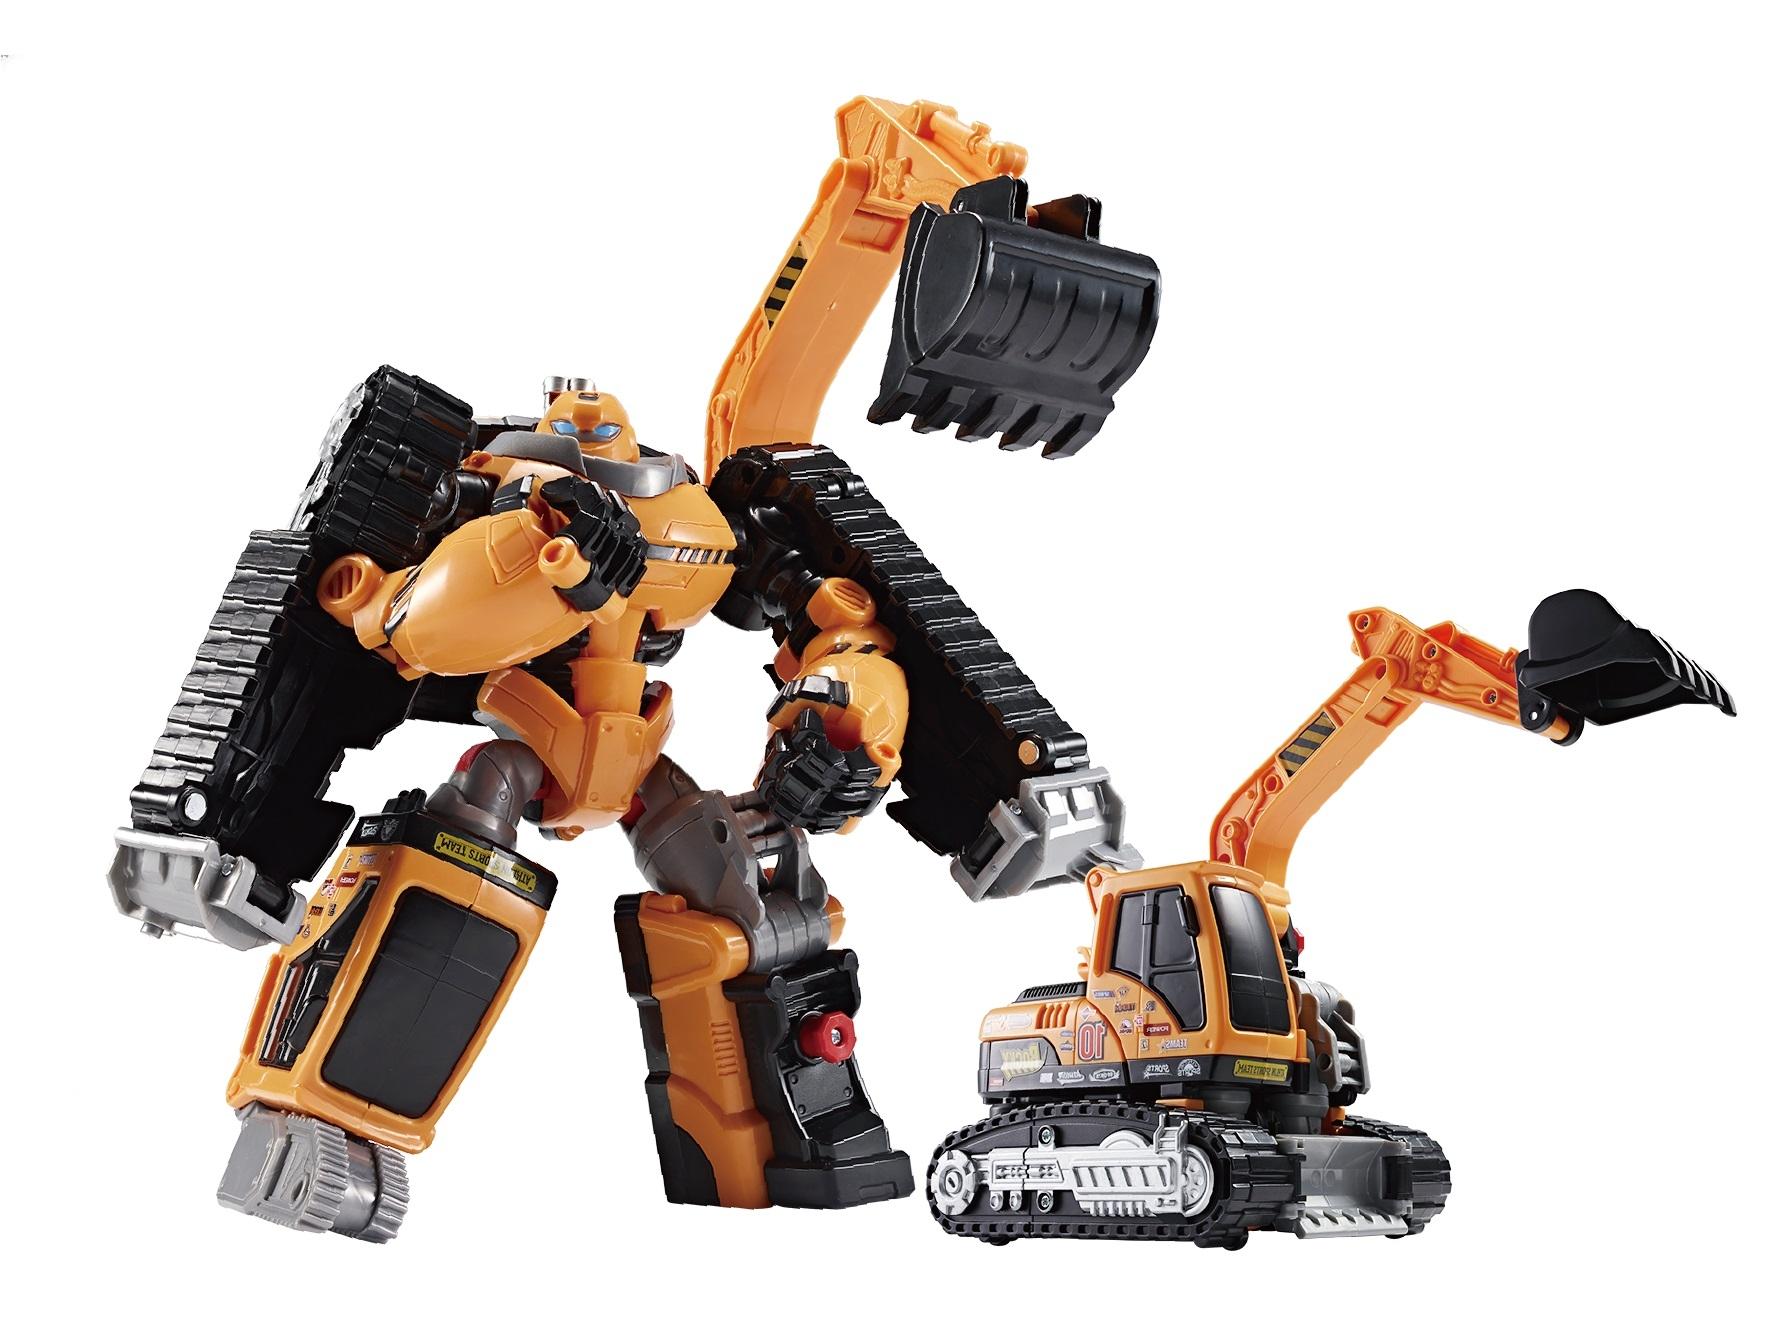 робот-трансформер Tobot Атлон Рокки S2